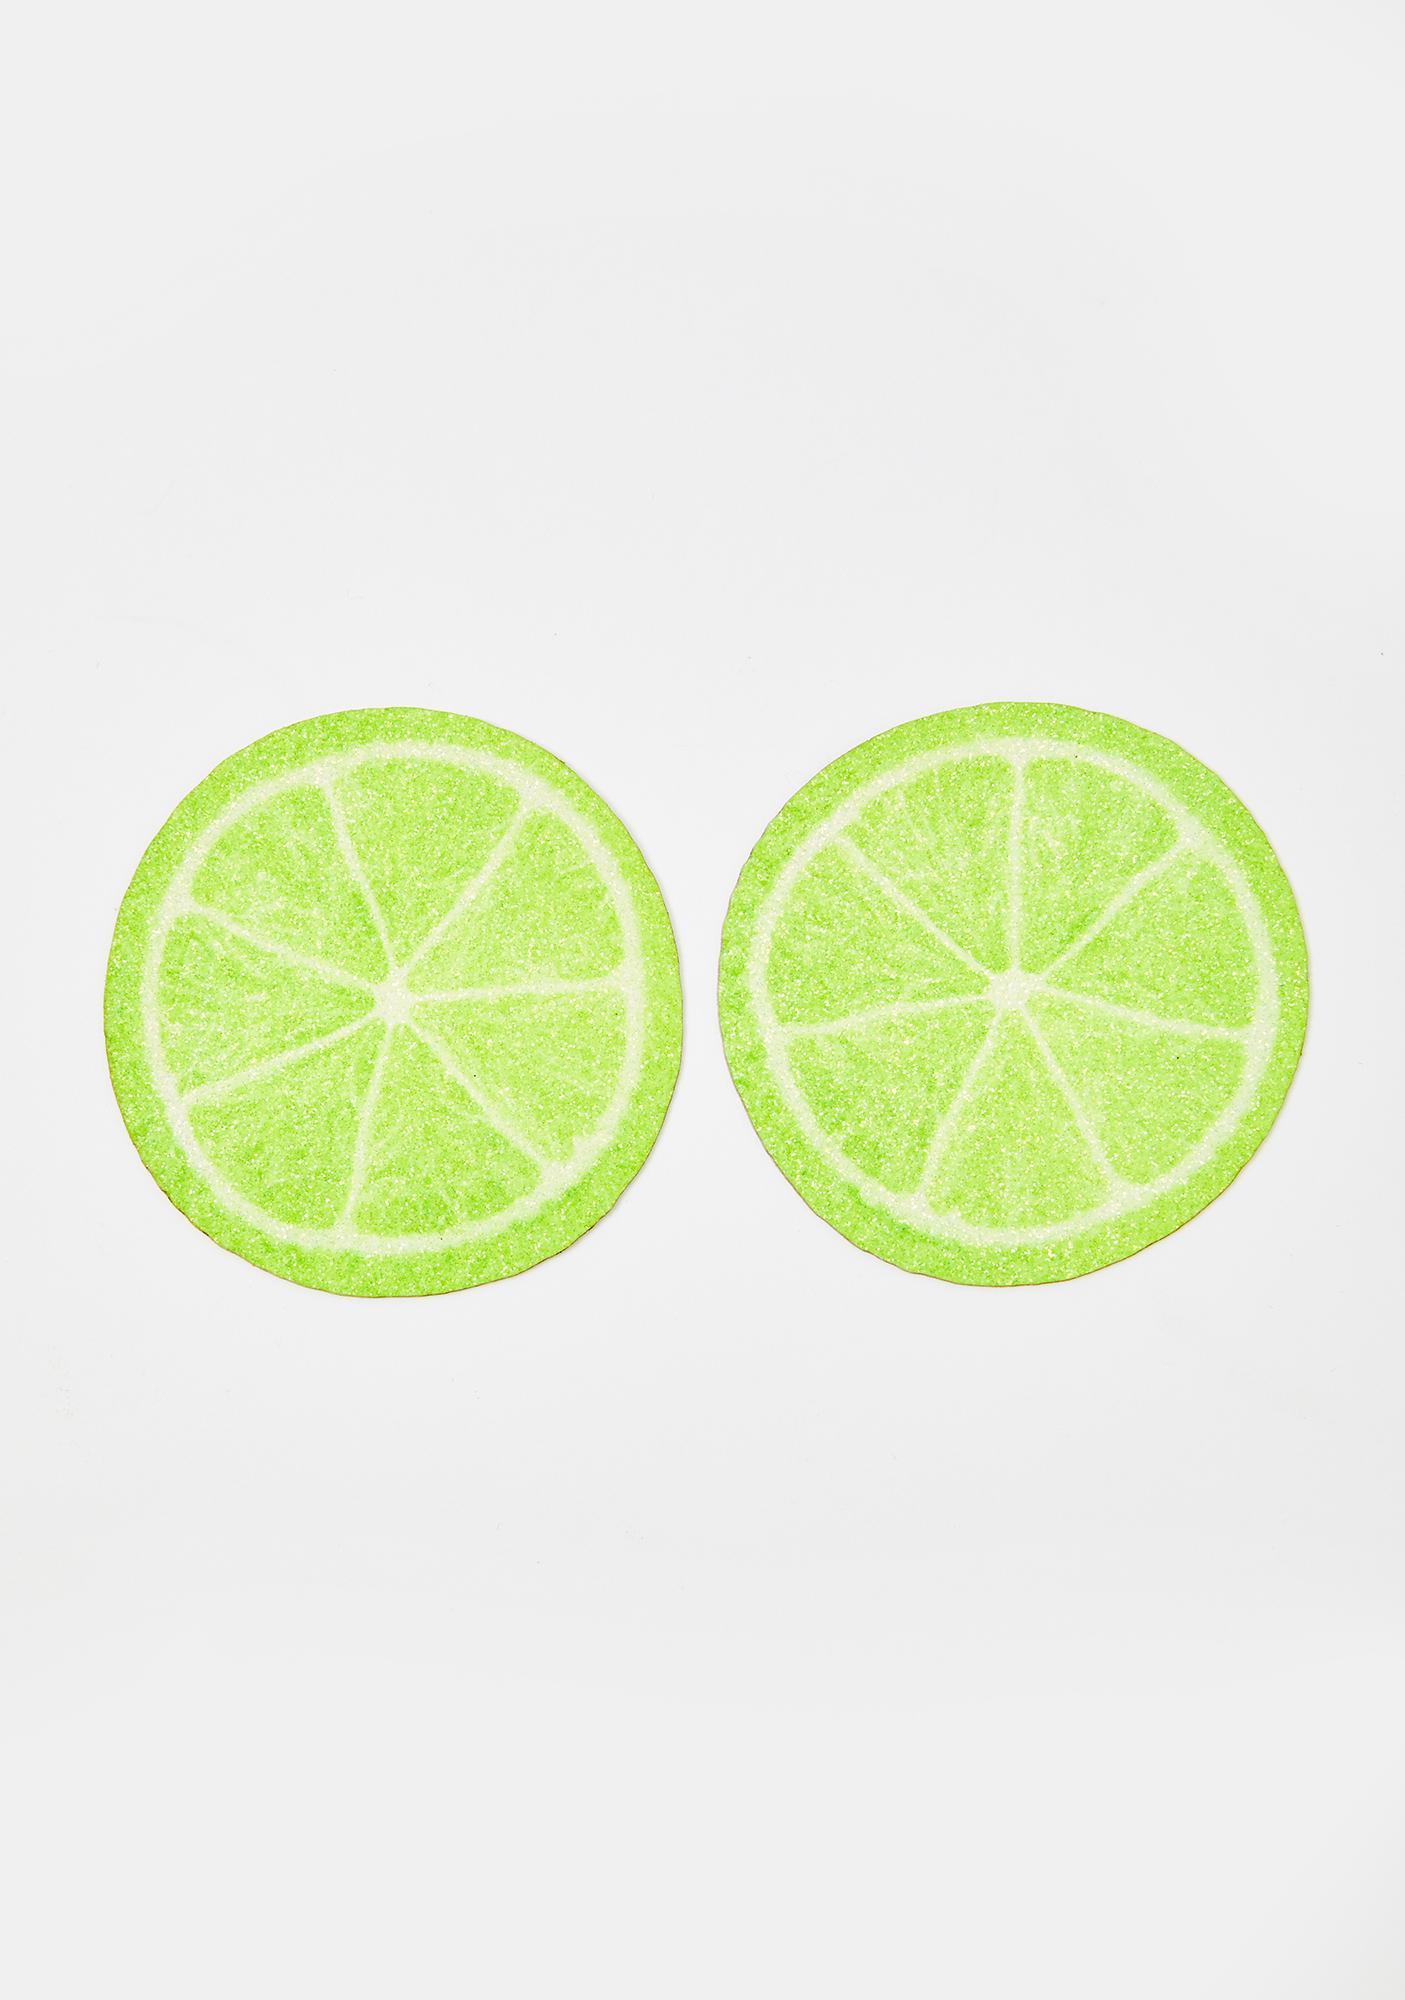 Neva Nude Lime Slice Glitter Pasties